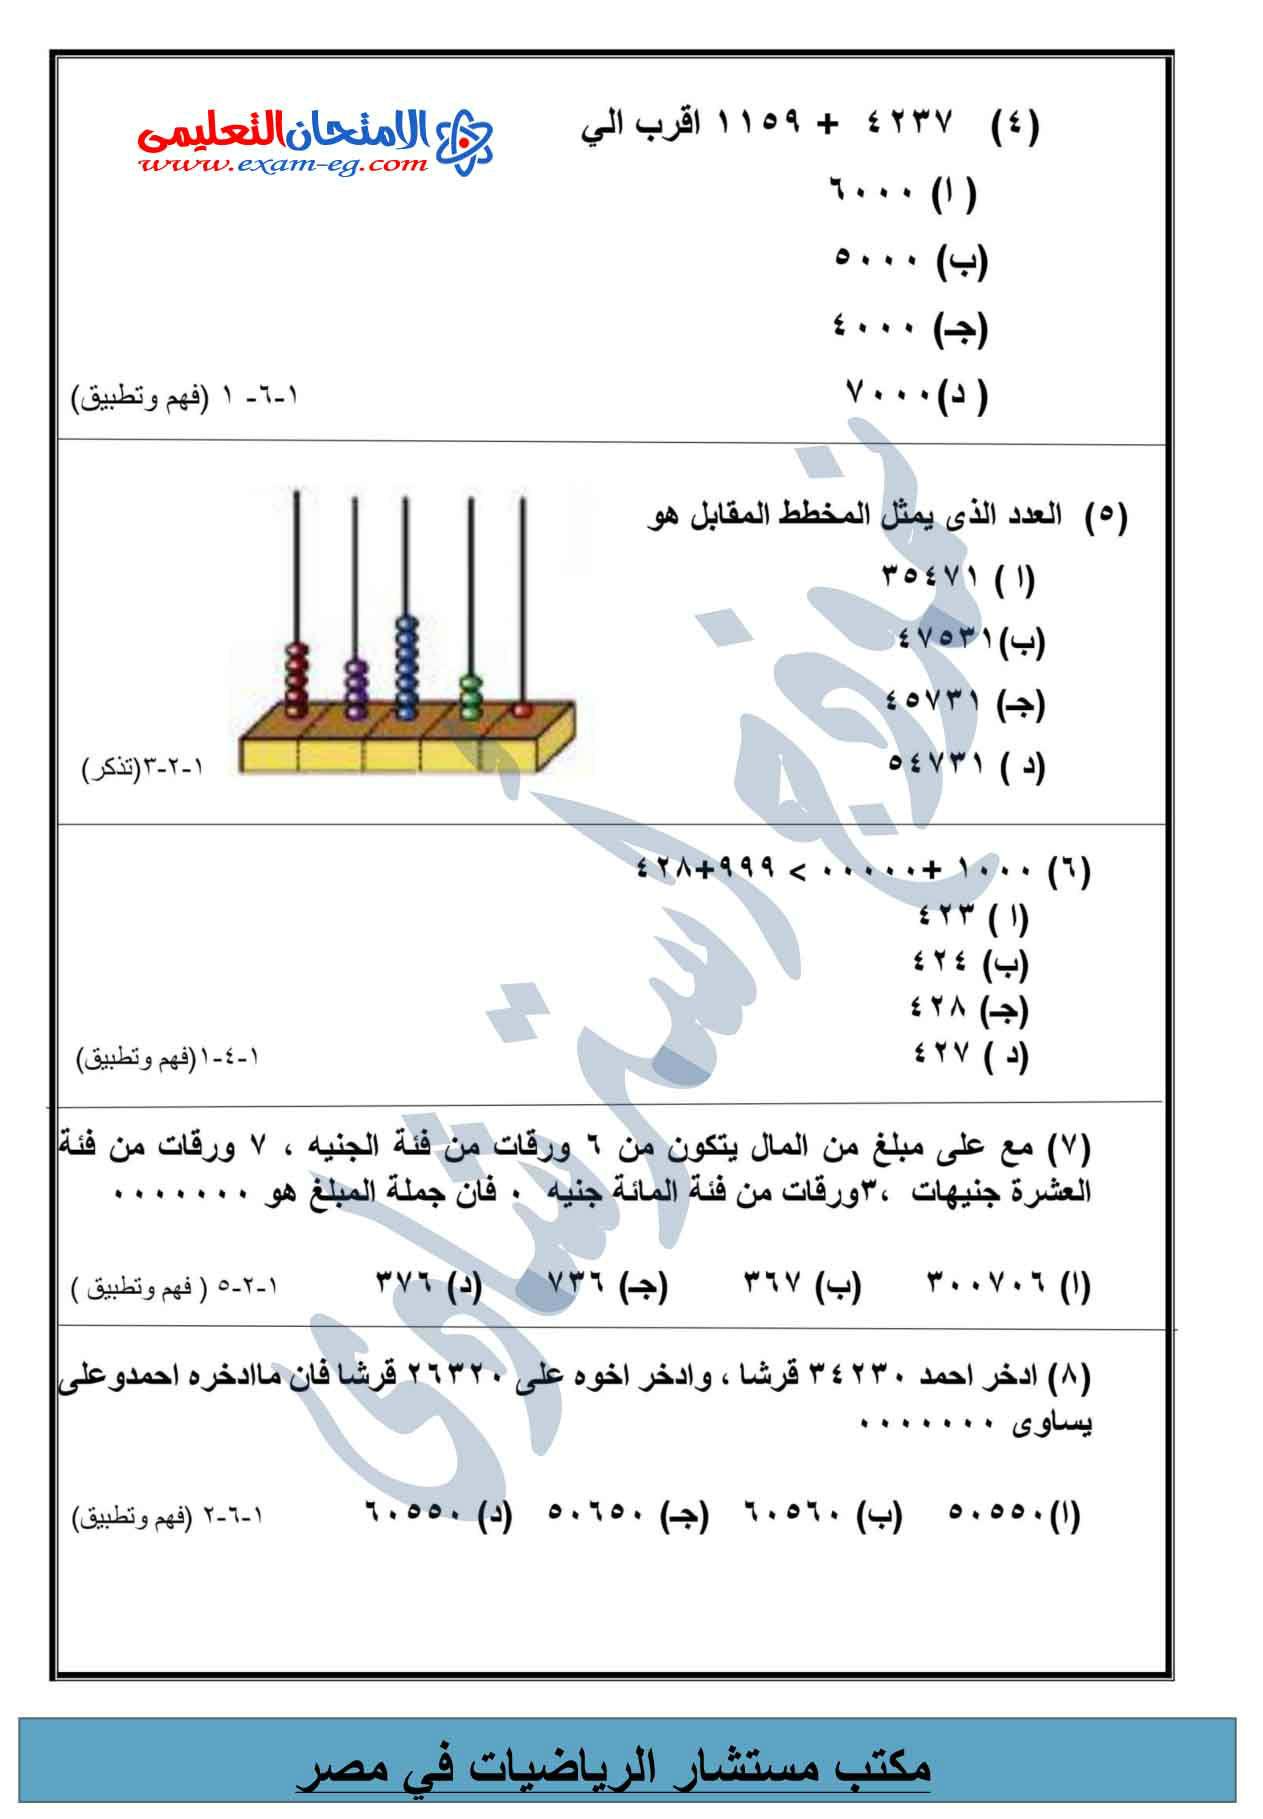 exam-eg.com_1449242035316.jpg